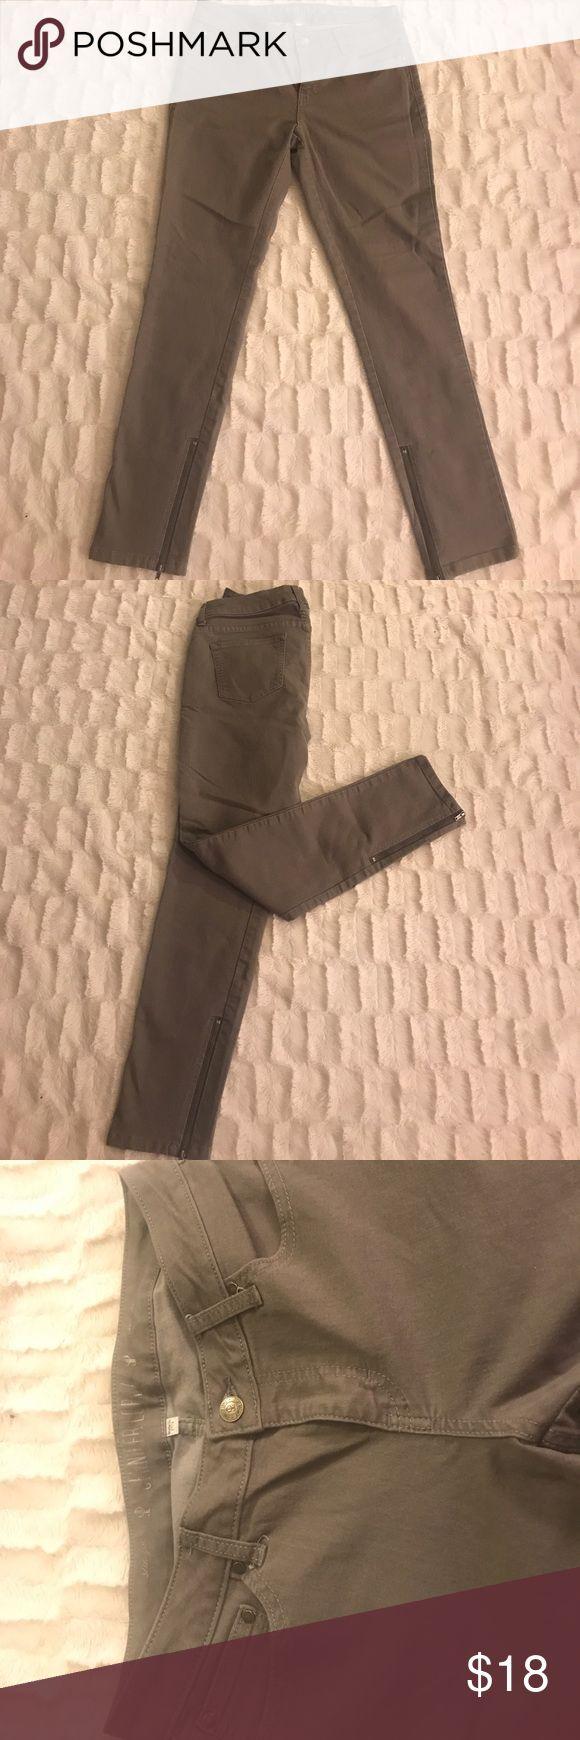 Jennifer Lopez straight leg jeans Jennifer Lopez straight leg jeans with a zipper on the ankle Jeans Straight Leg